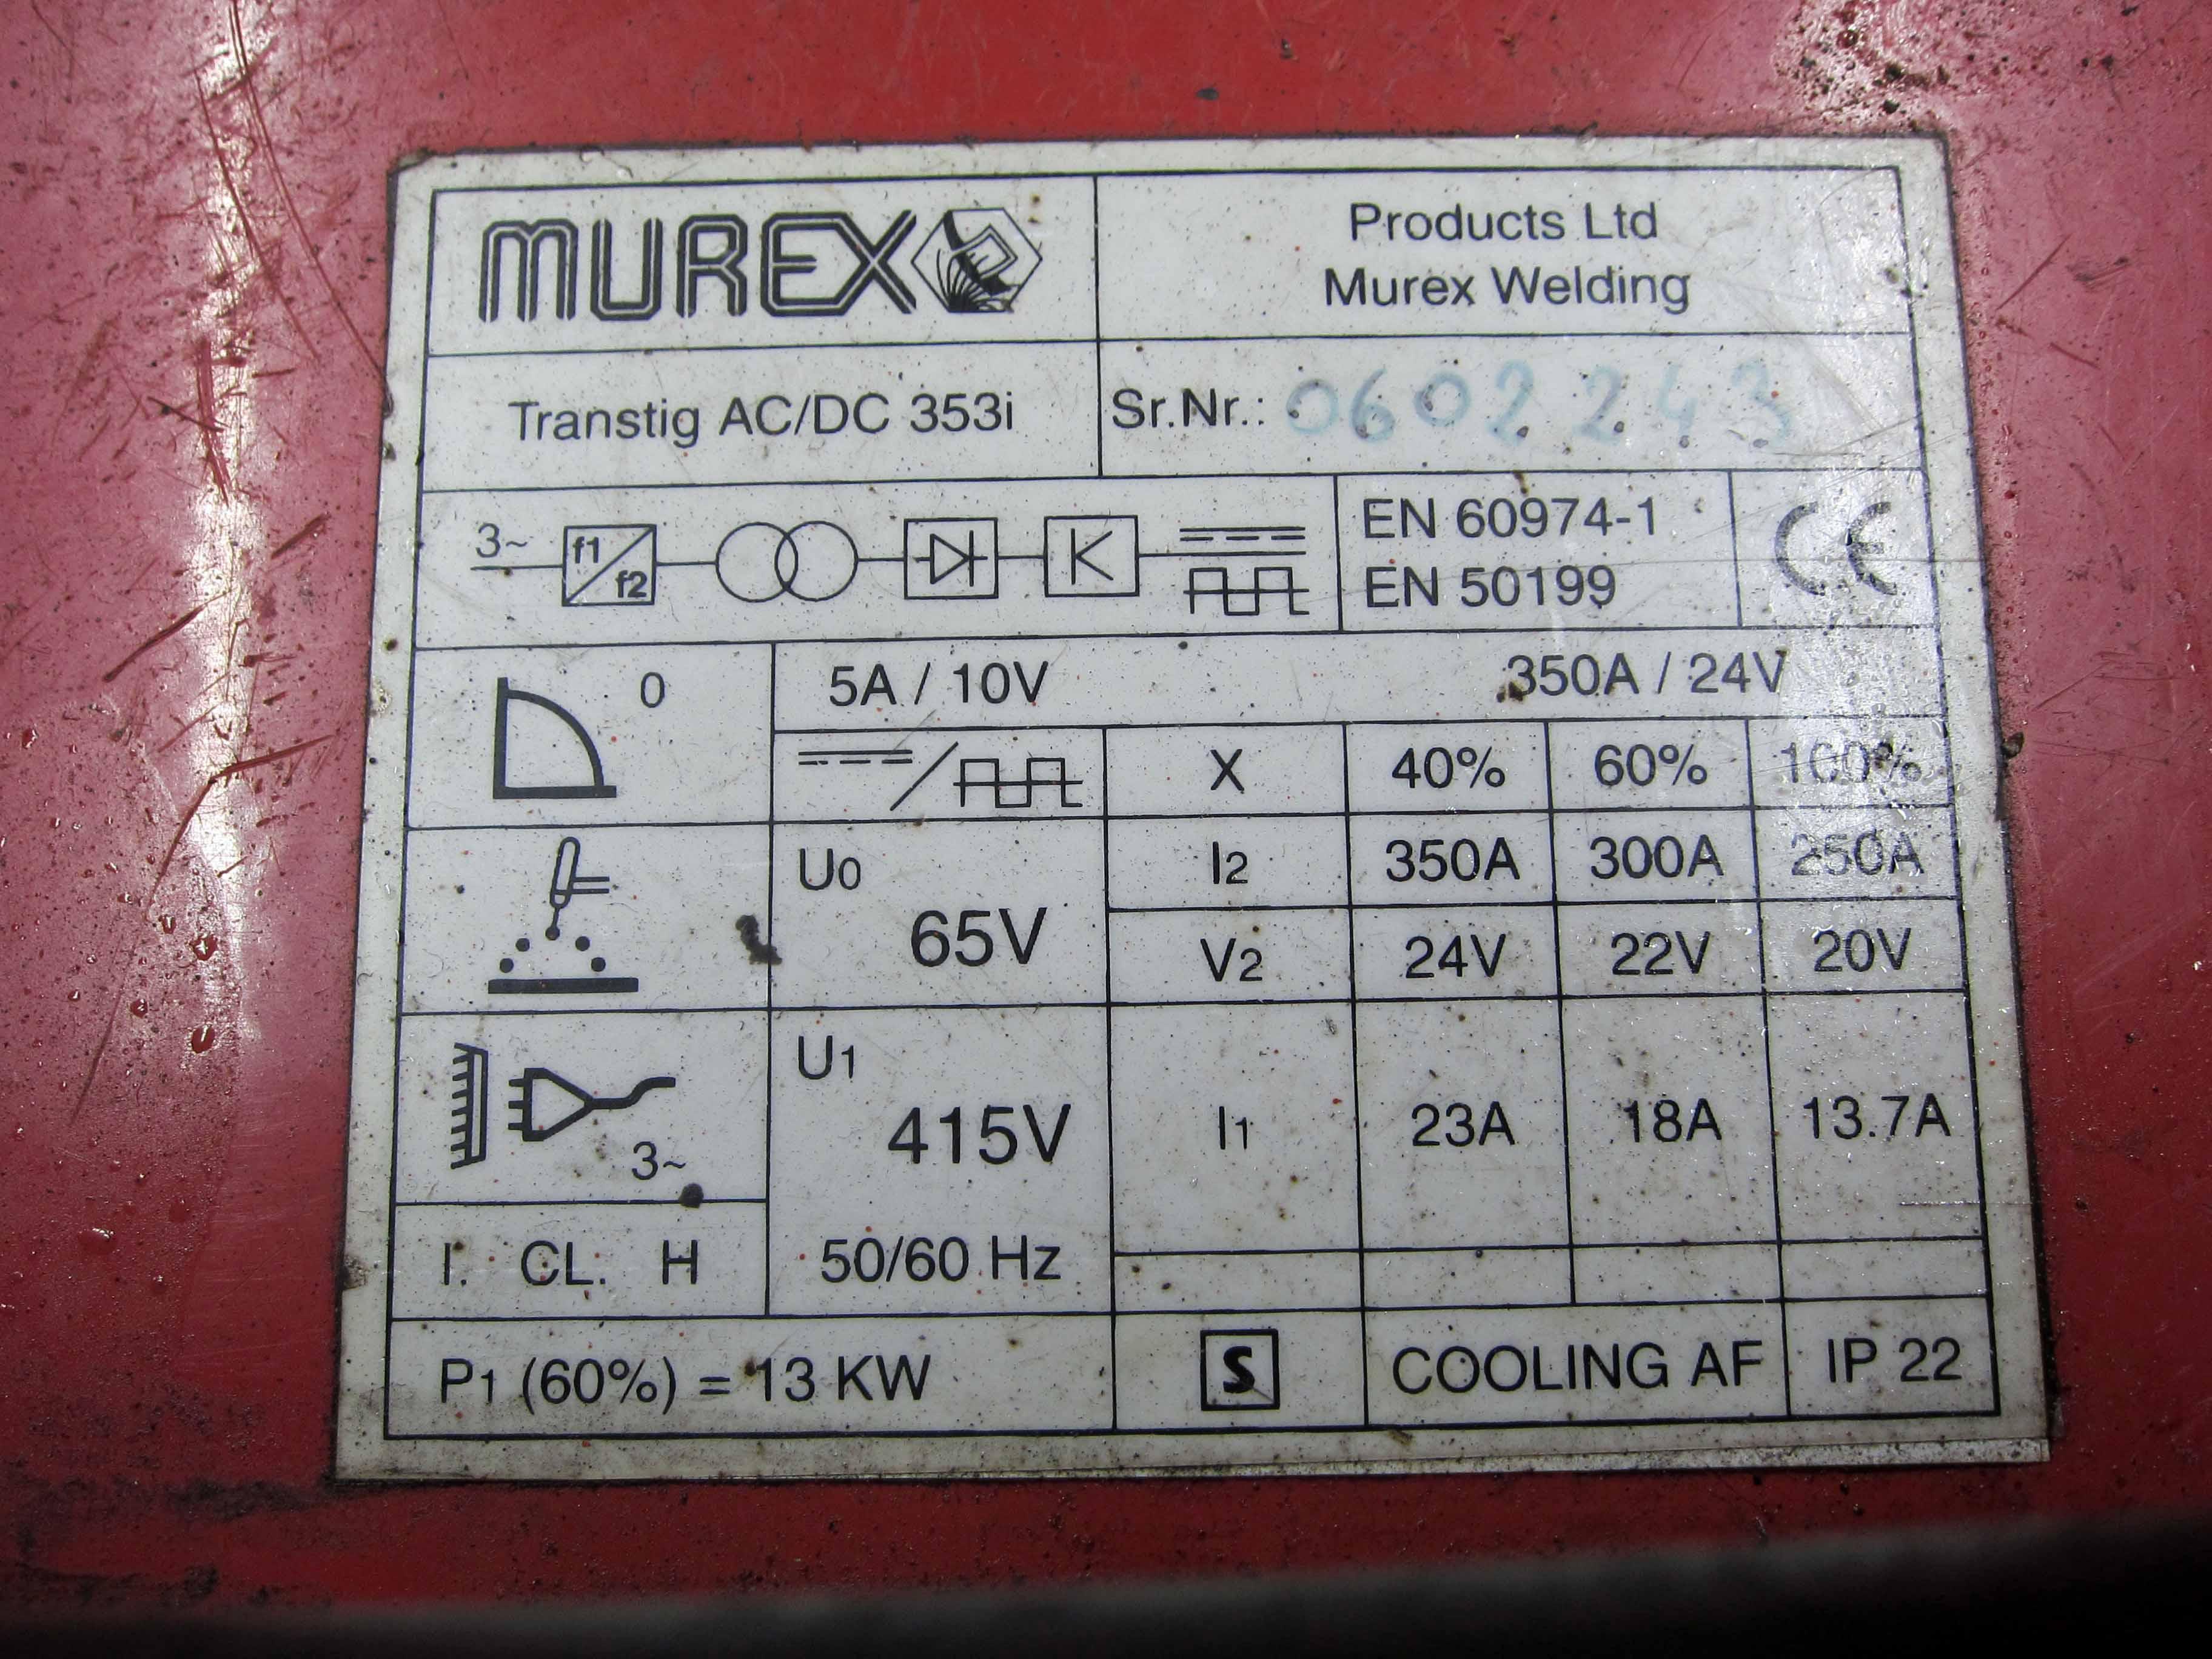 A MUREX Model Transtig AC/DC 353i Tig Welder, Serial No. 0602243, complete with MUREX Model TWCU, - Image 7 of 9